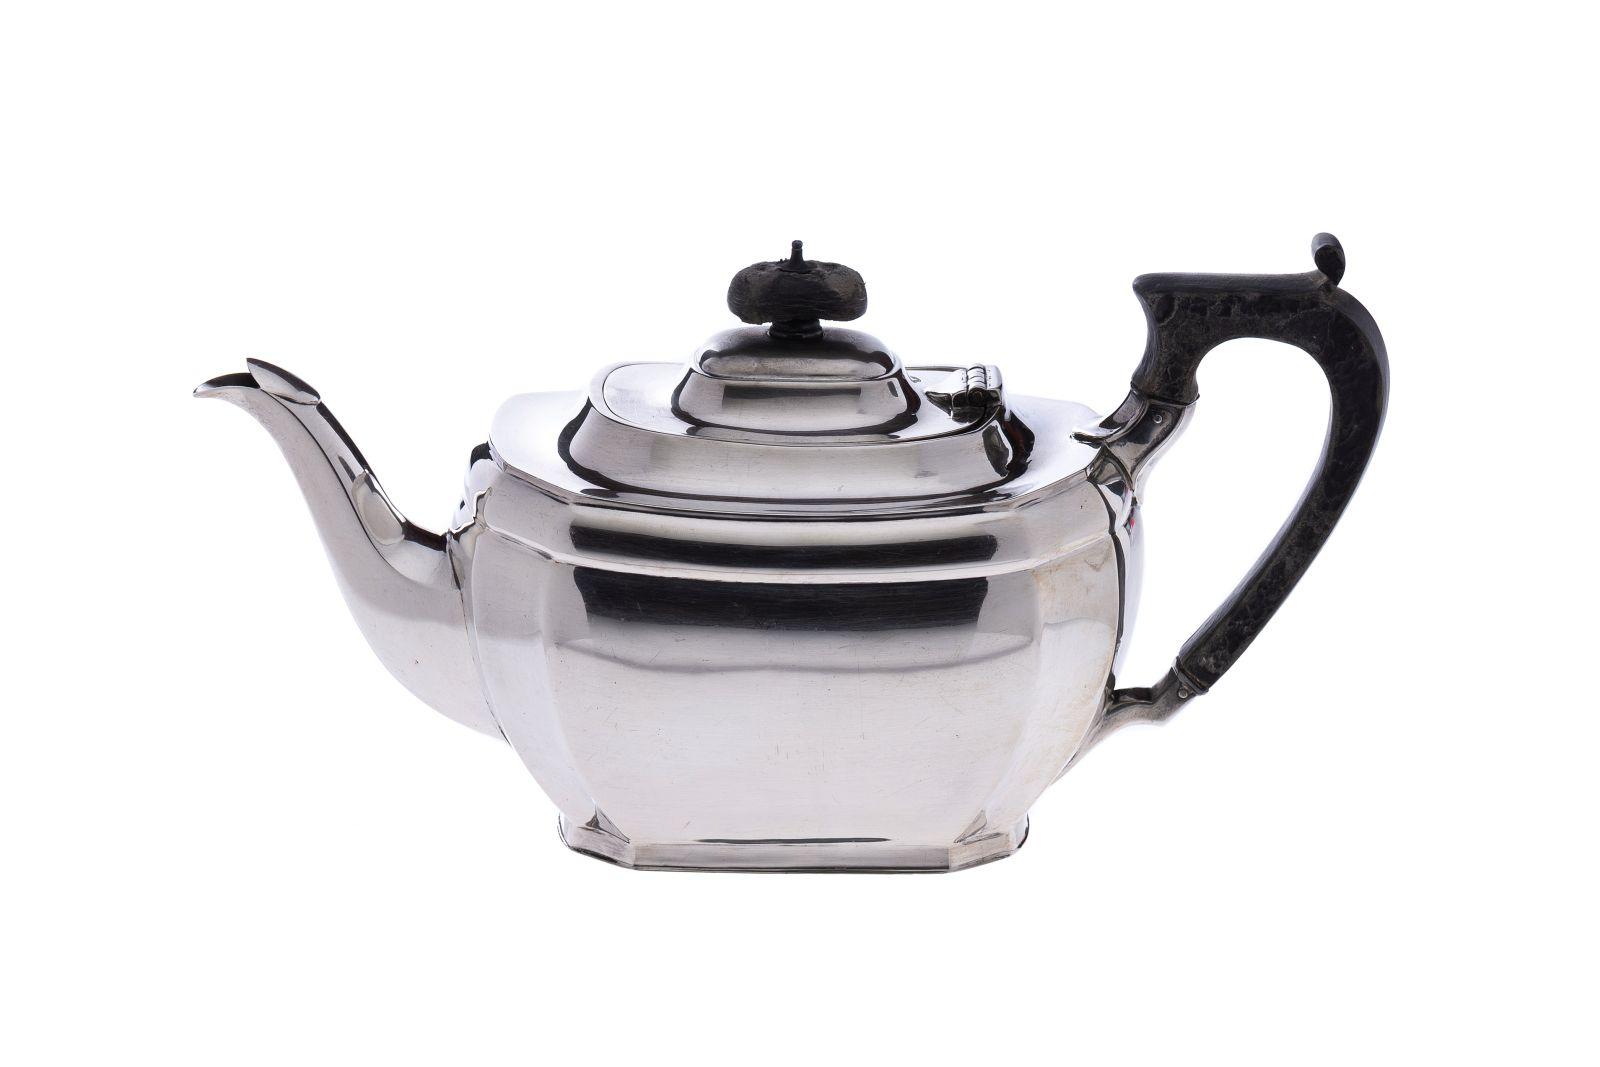 #70 English teapot | Englische Teekanne Image